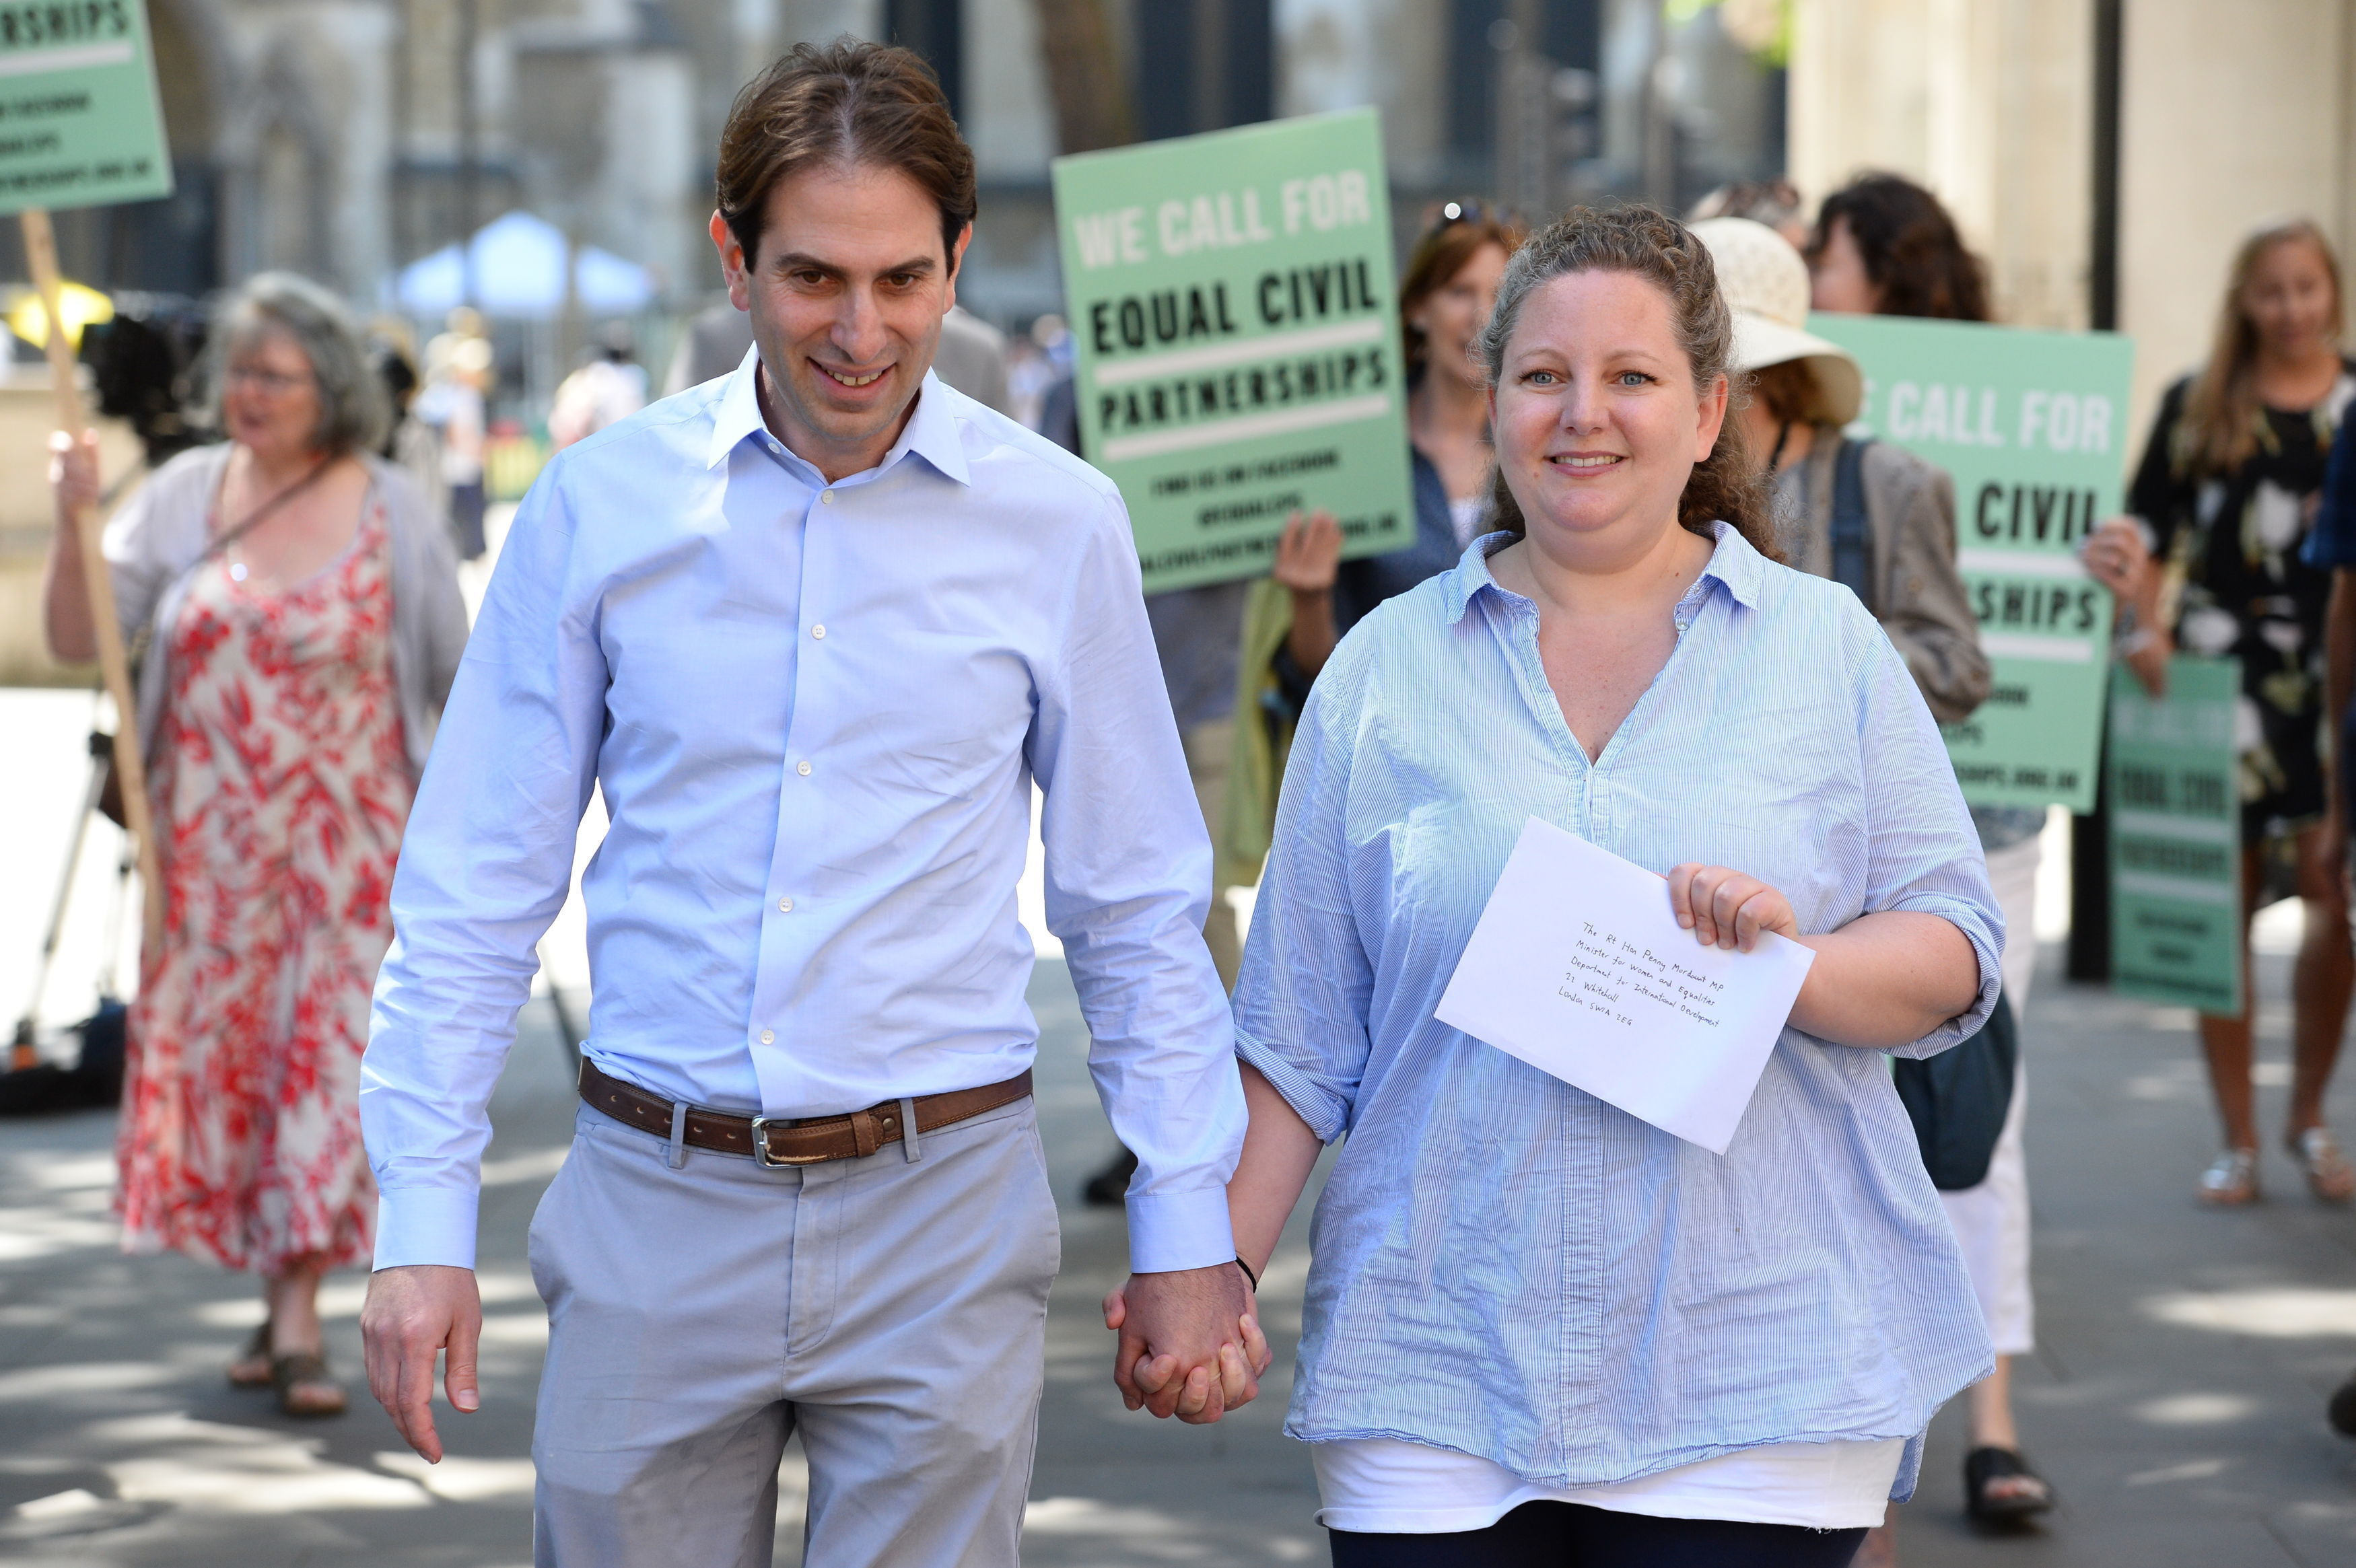 What is a heterosexual civil partnership scotland